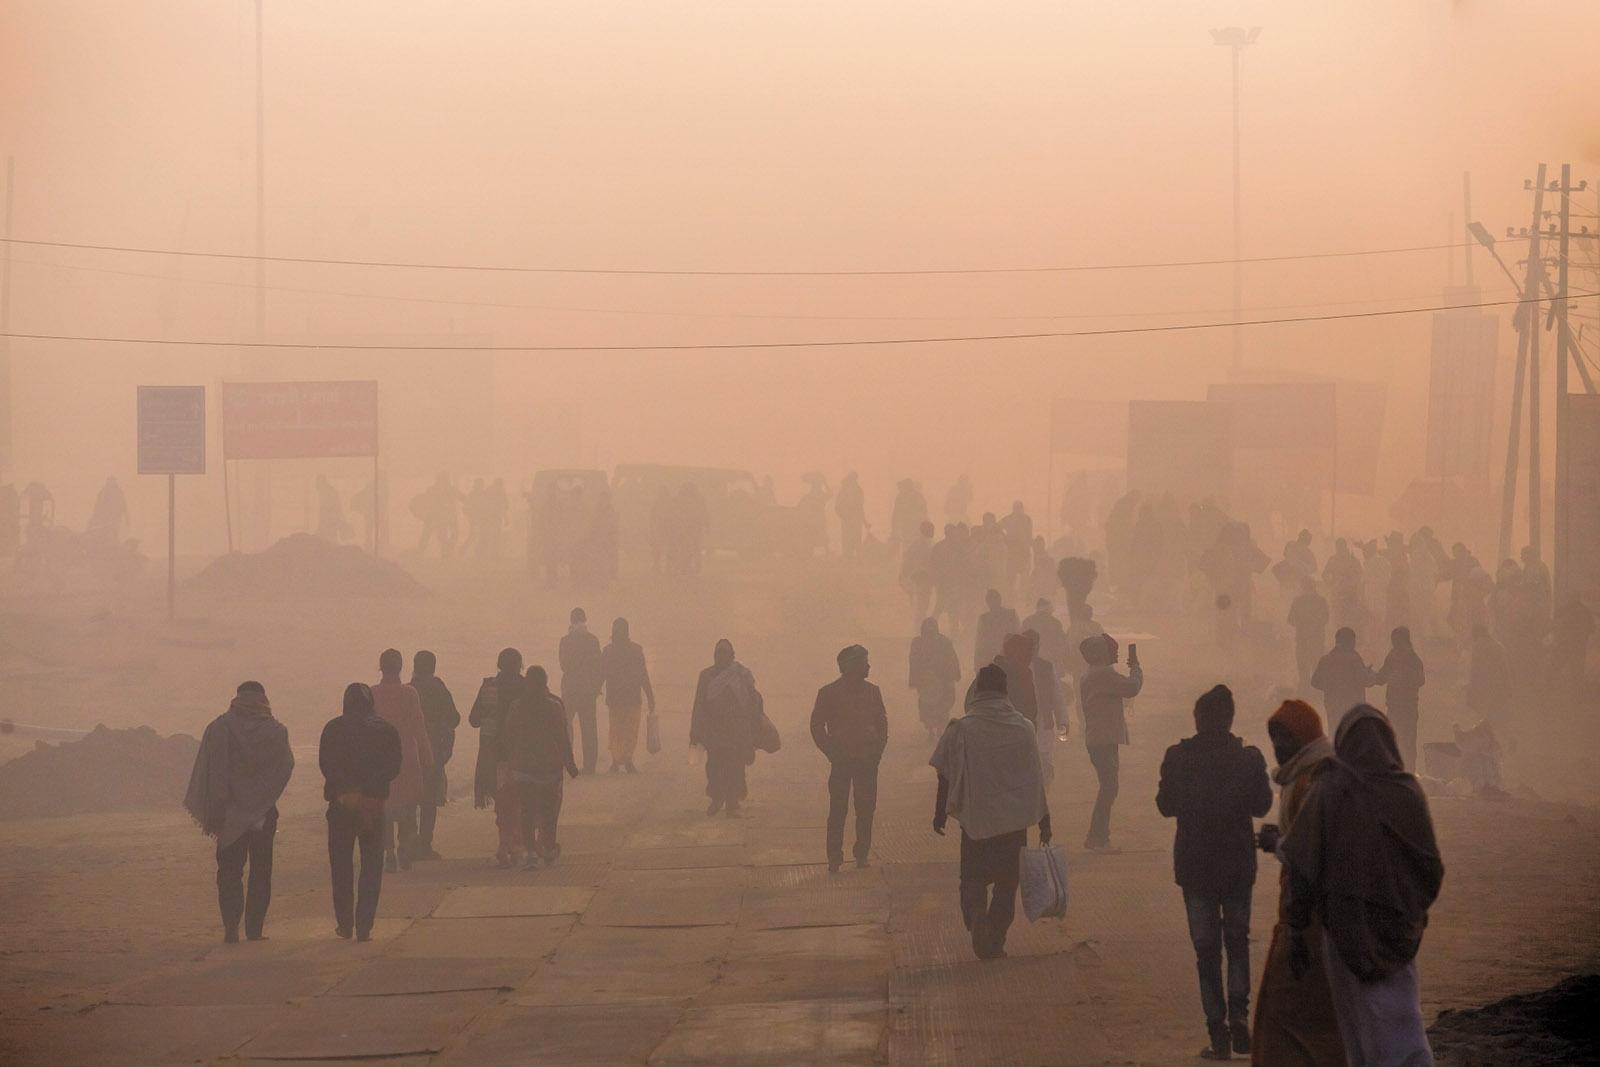 Smog in Prayagraj, Uttar Pradesh, India, January 2019